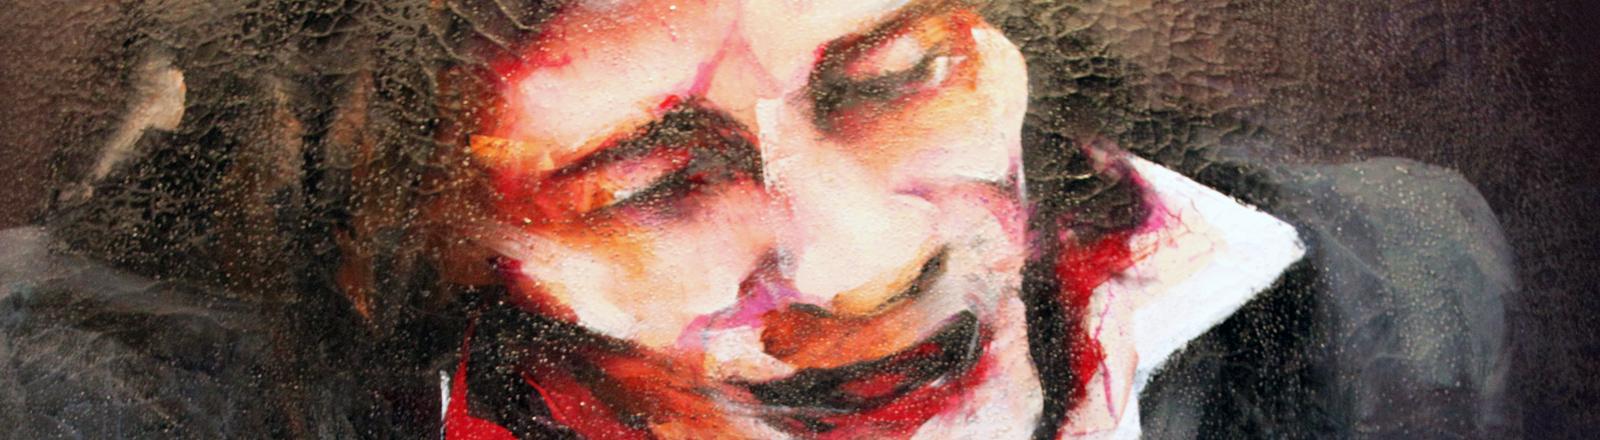 """Camarón 16"" von Lita Cabellut http://kaidikhas.com/de/artist/lita_cabellut/works/camaroen_16"